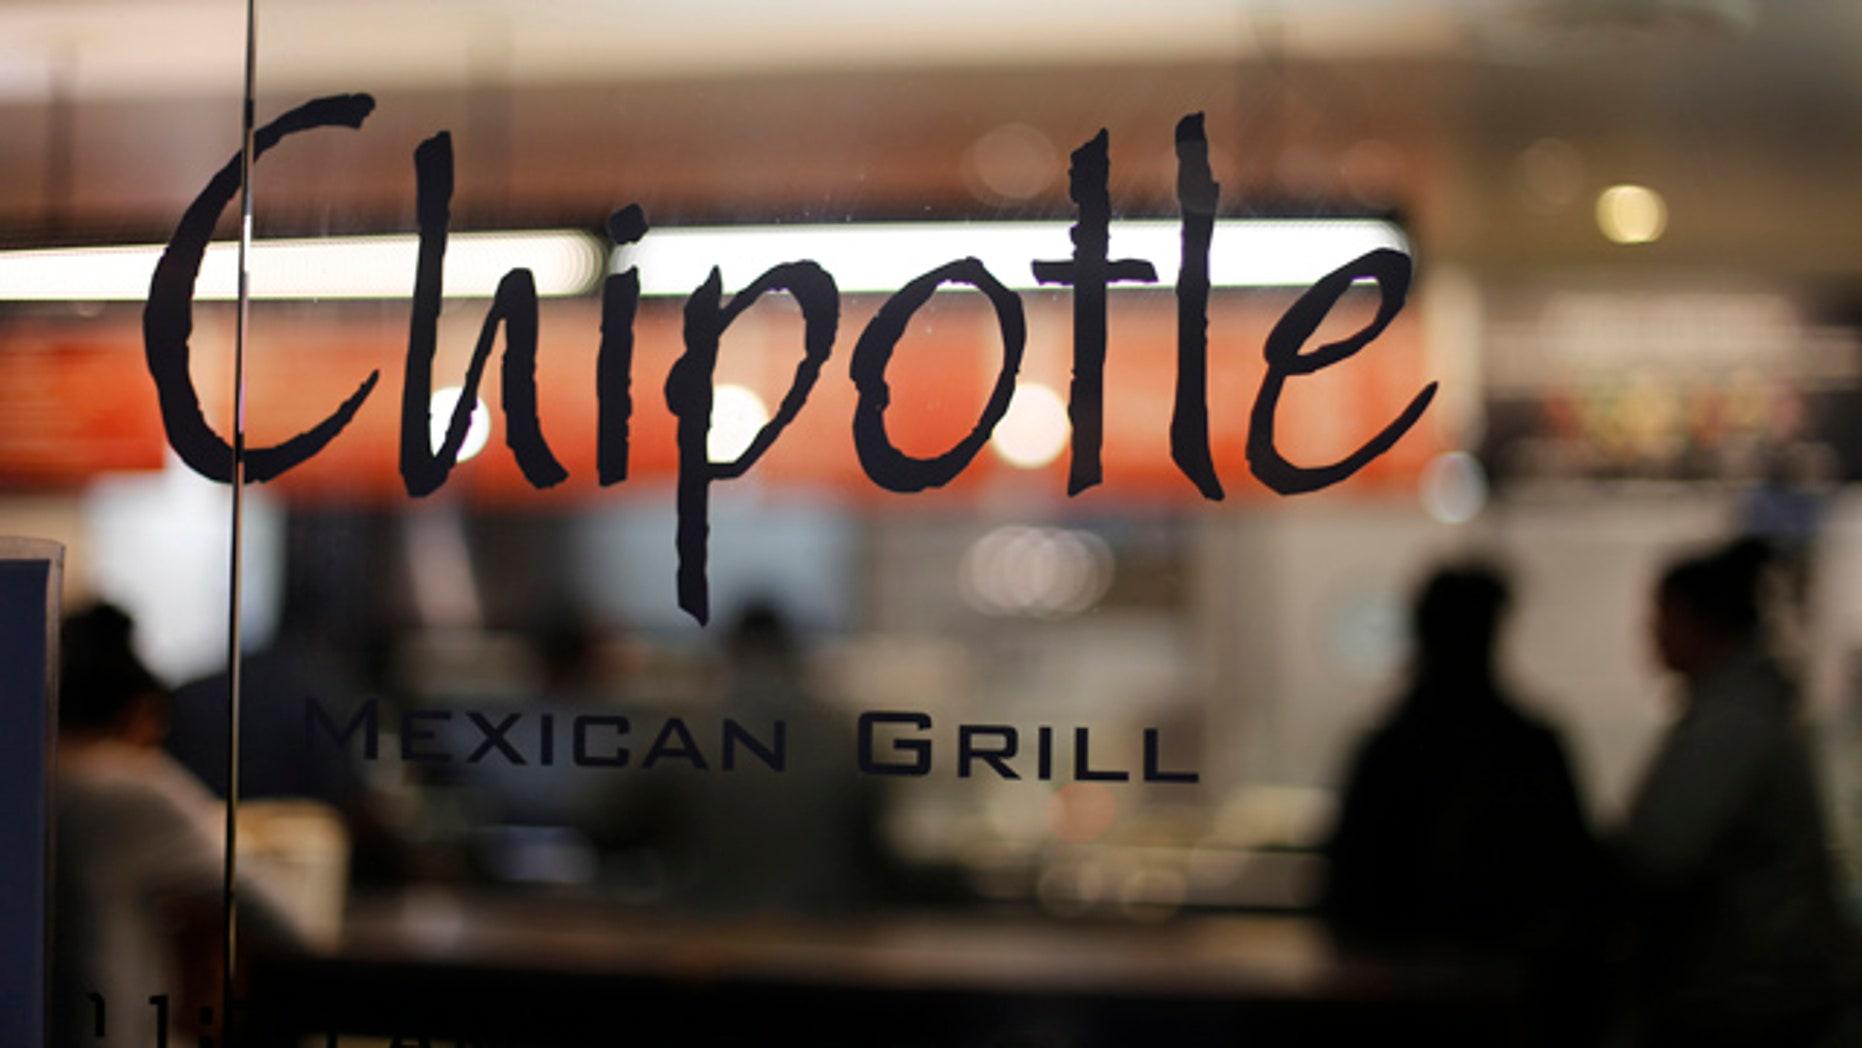 FILE - This Sunday, Dec. 27, 2015, file photo, shows a Chipotle restaurant in Union Station in Washington. (AP Photo/Gene J. Puskar, File)